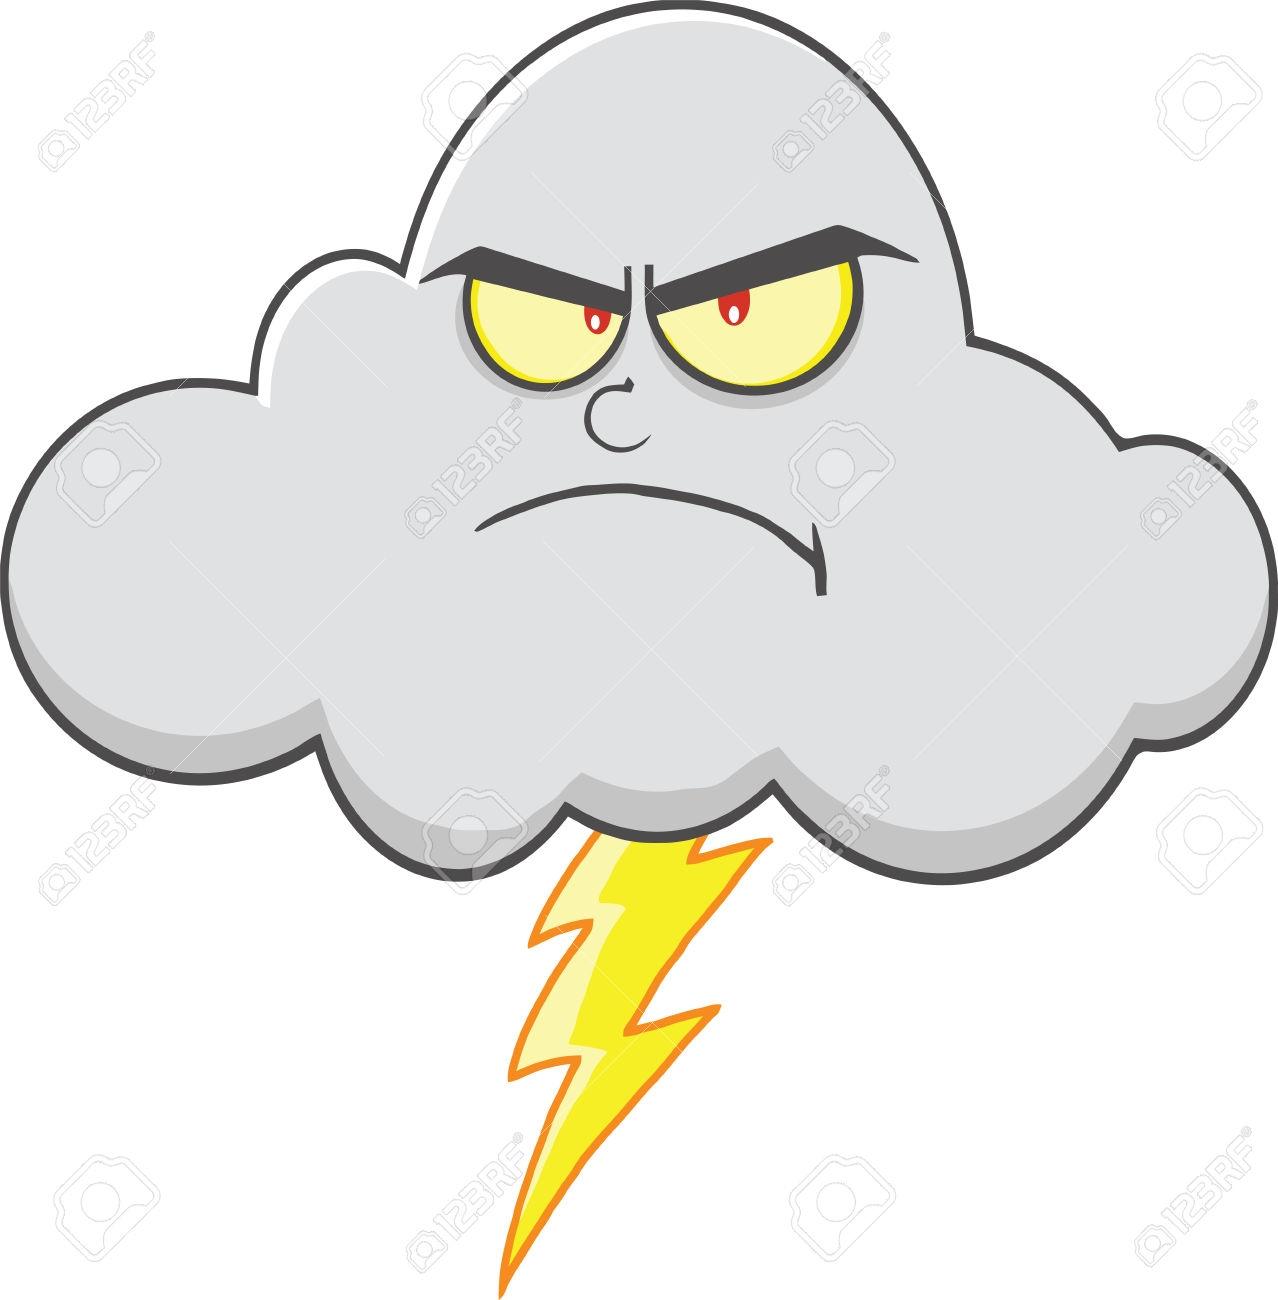 Vector and Lightning Cloud Clipart 4017 Favorite ClipartFan.com.